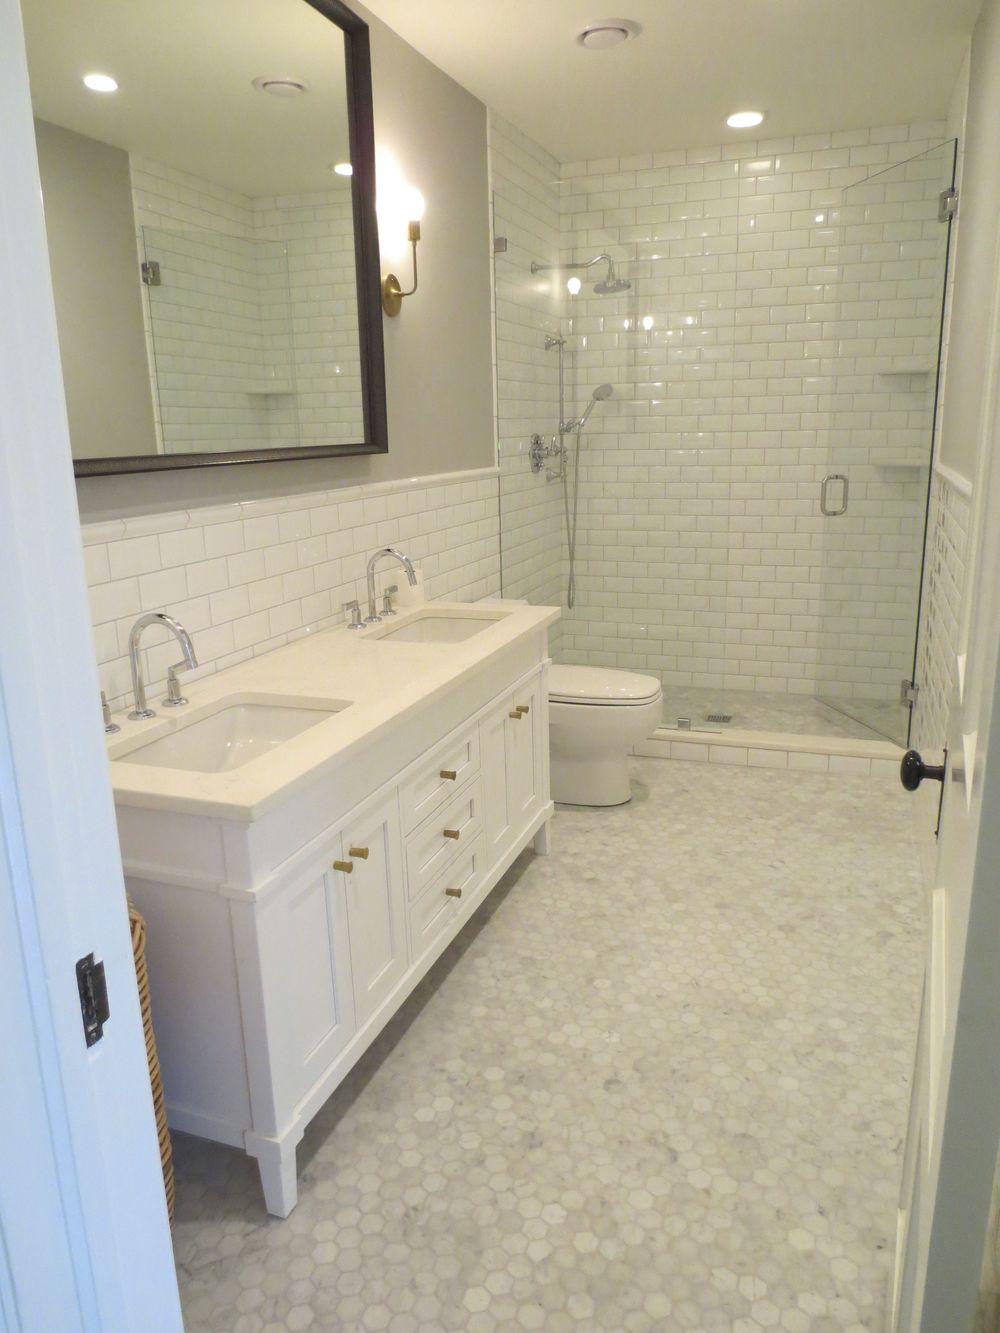 Bathroom Renovation - White Subway Tile